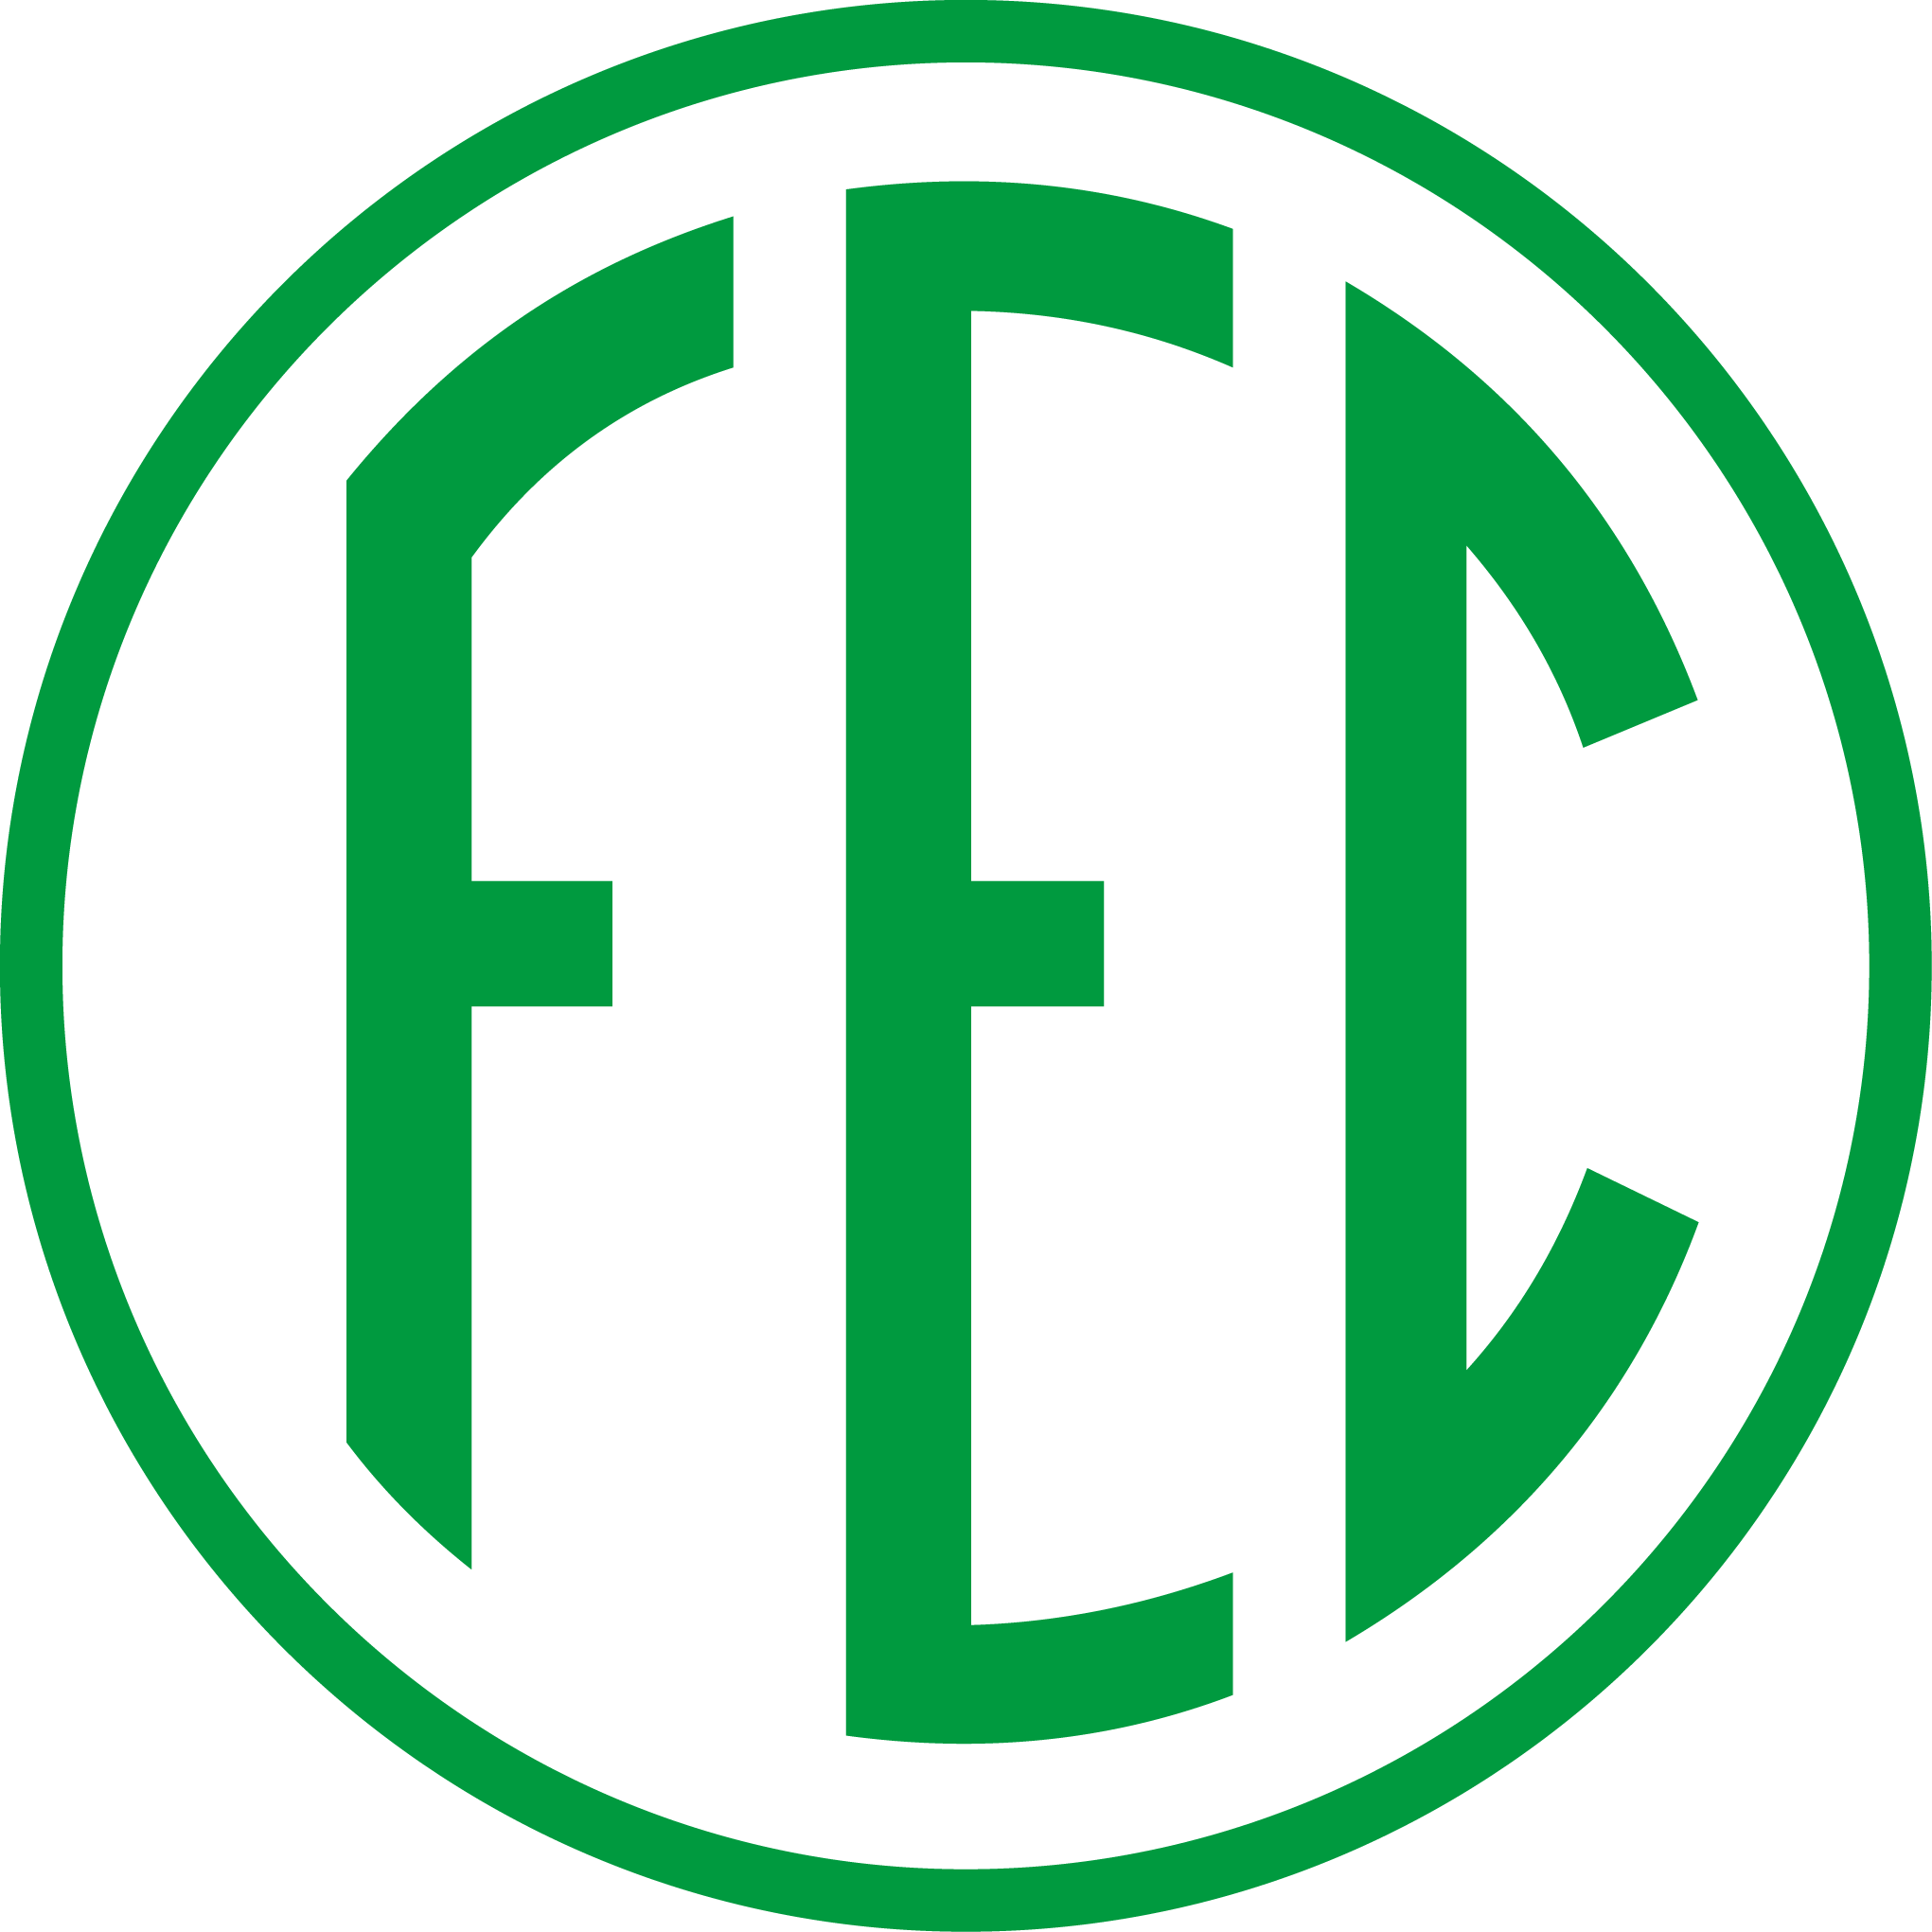 Florida Esporte Clube